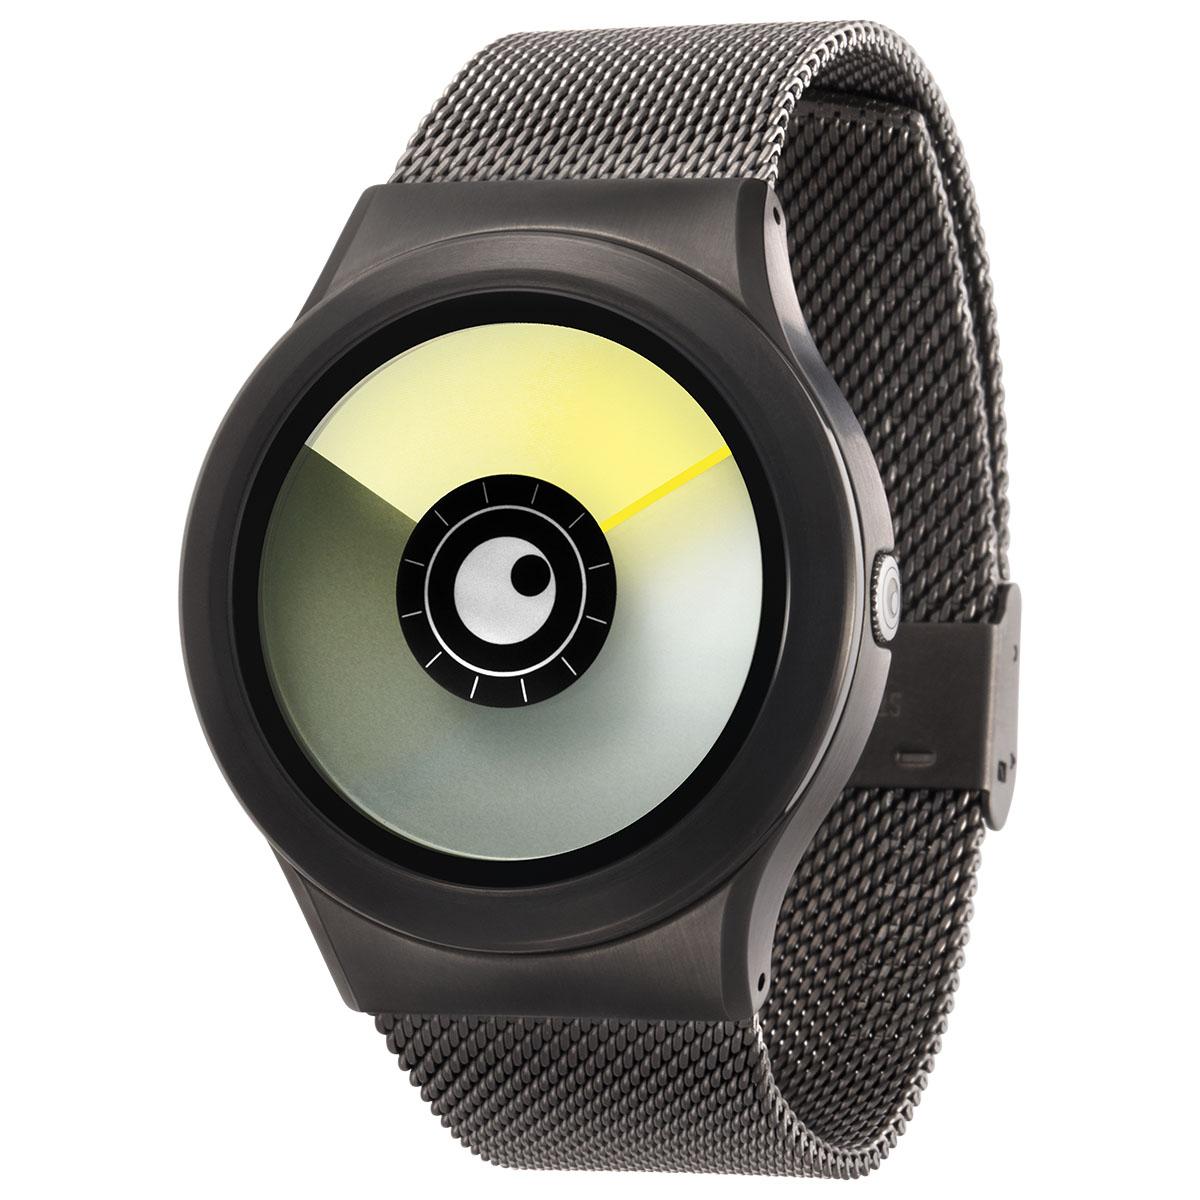 ZEROO AURORA BOREALIS ゼロ 電池式クォーツ 腕時計 [W12021B02SM02] イエロー デザインウォッチ ペア用 メンズ レディース ユニセックス おしゃれ時計 デザイナーズ